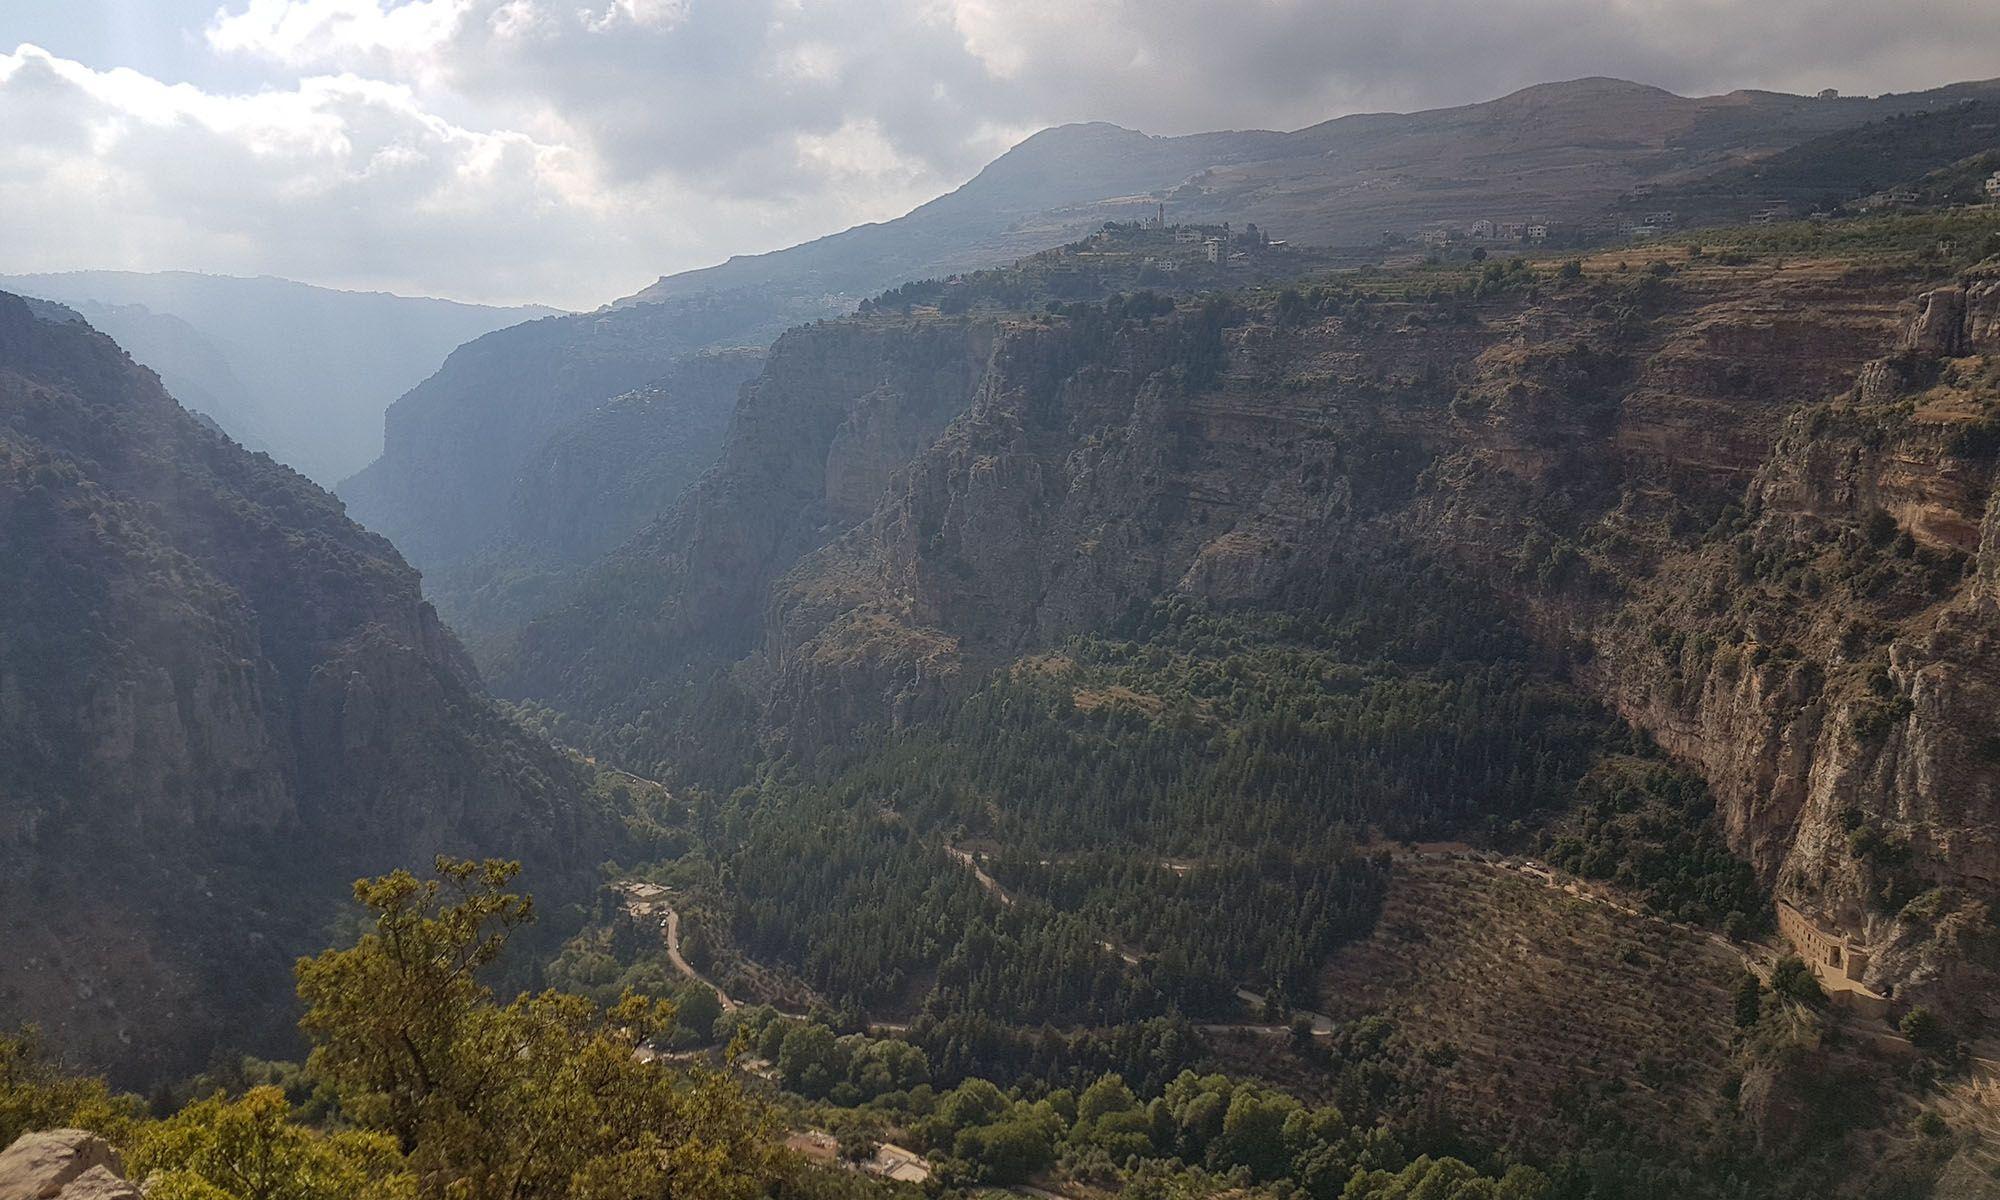 Libanon Qadisha Vallei